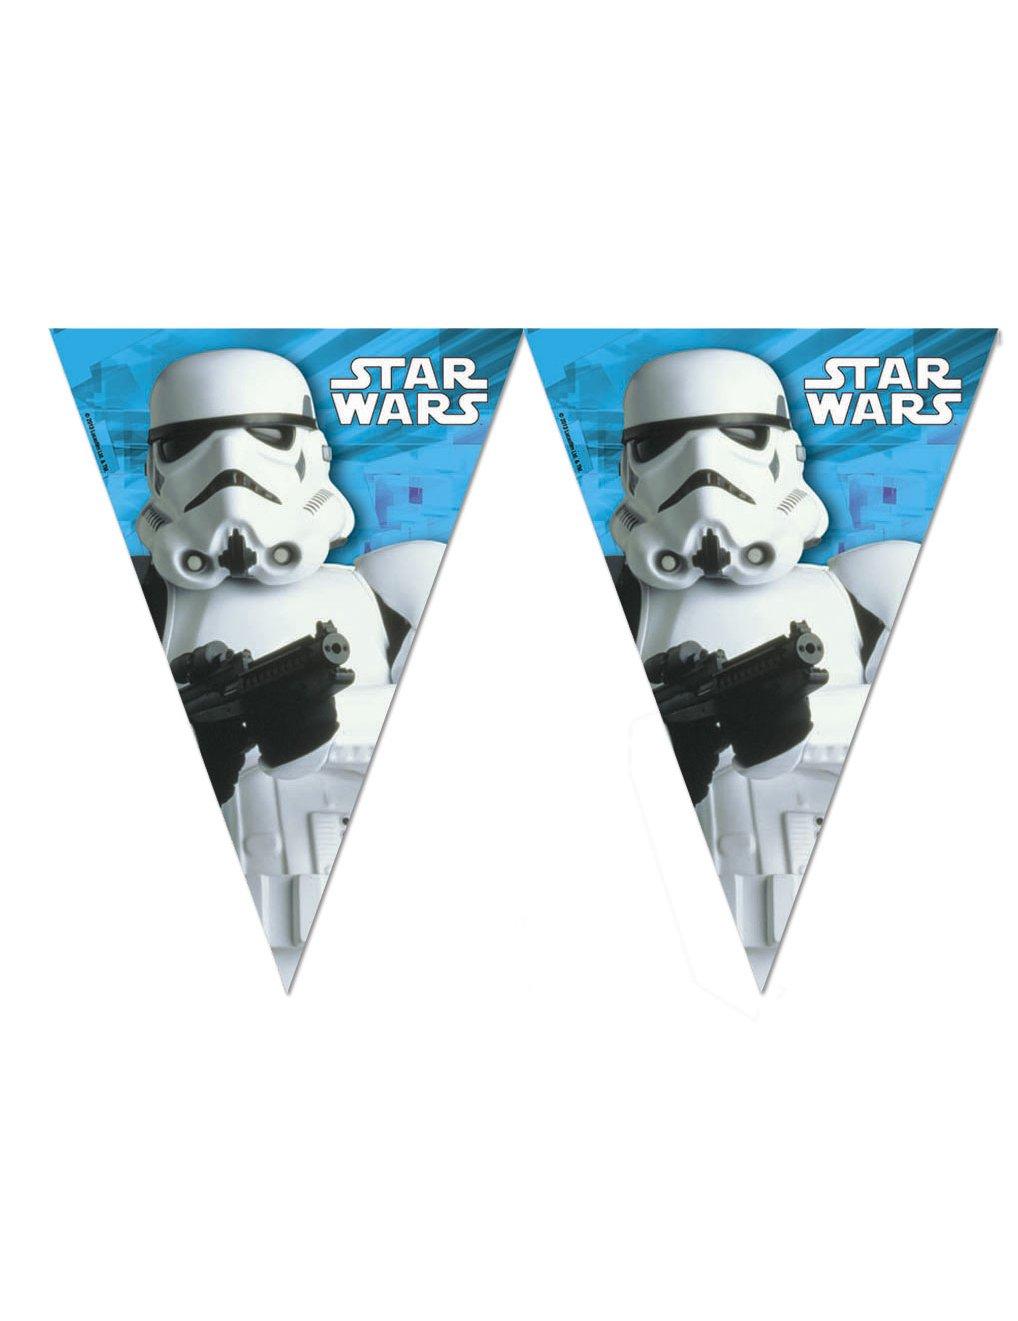 star wars wimpel girlande stormtrooper party deko bunt 280cm g nstige faschings partydeko. Black Bedroom Furniture Sets. Home Design Ideas